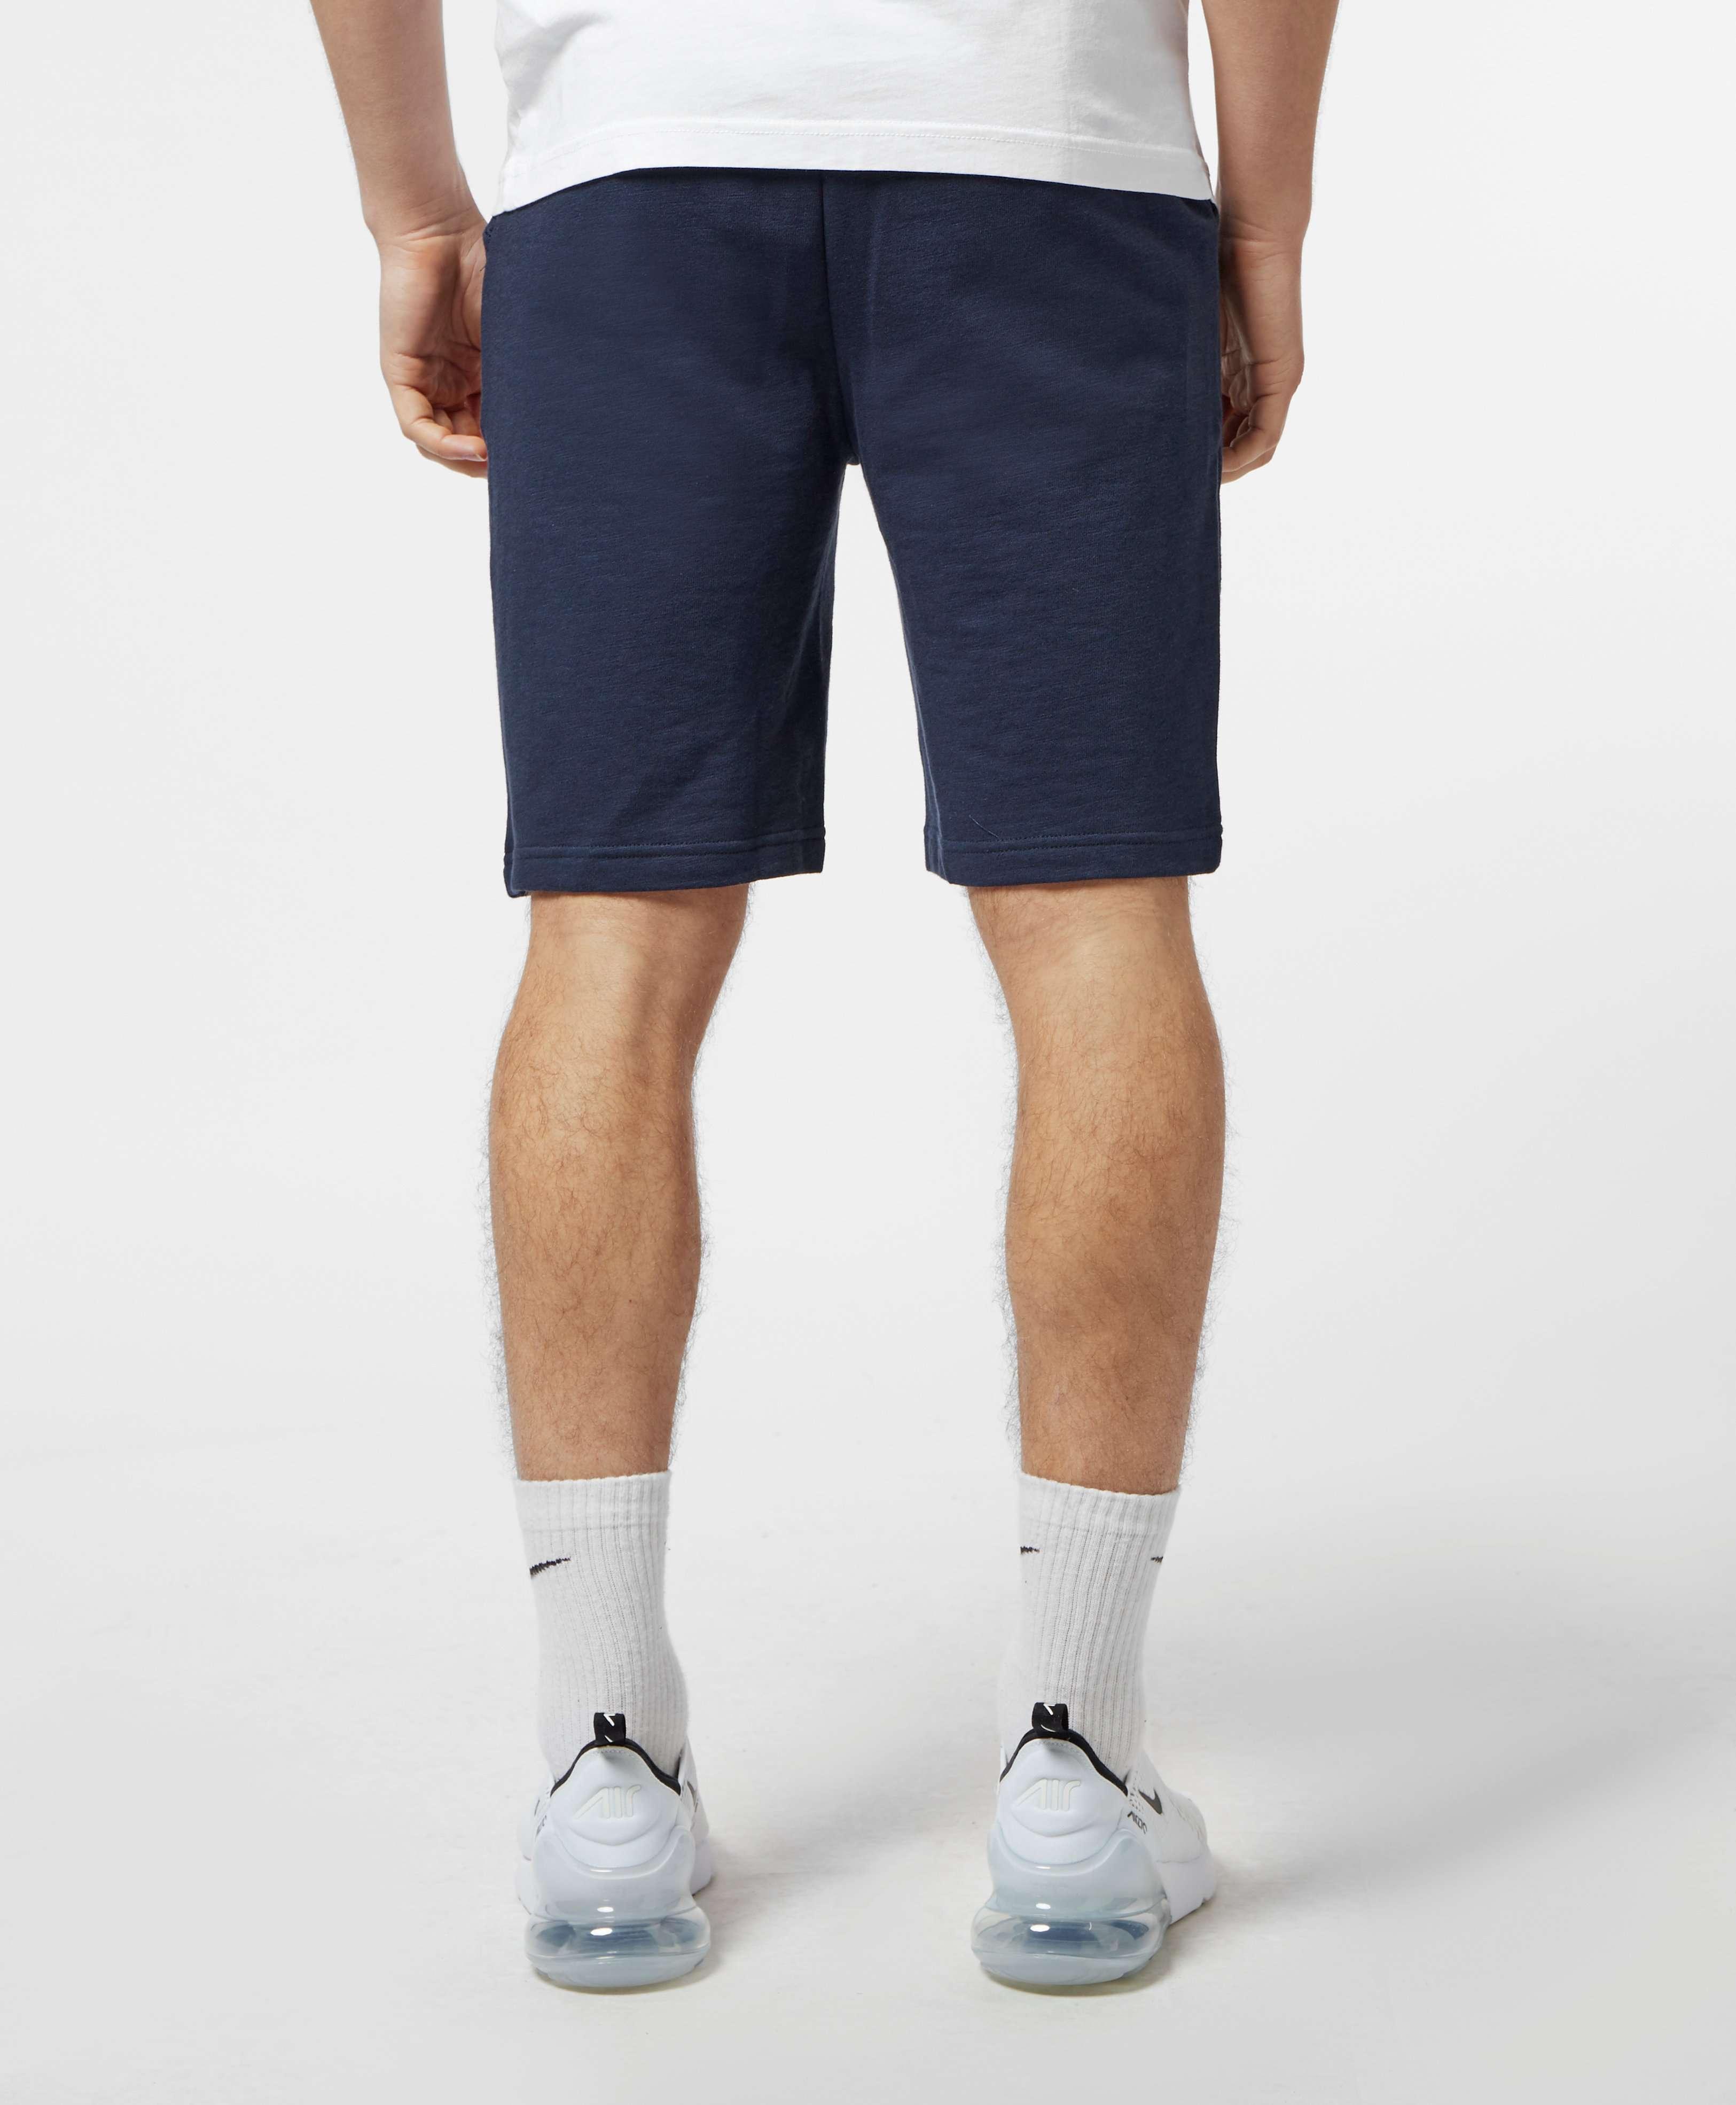 Tommy Hilfiger Embroidered Logo Fleece Shorts